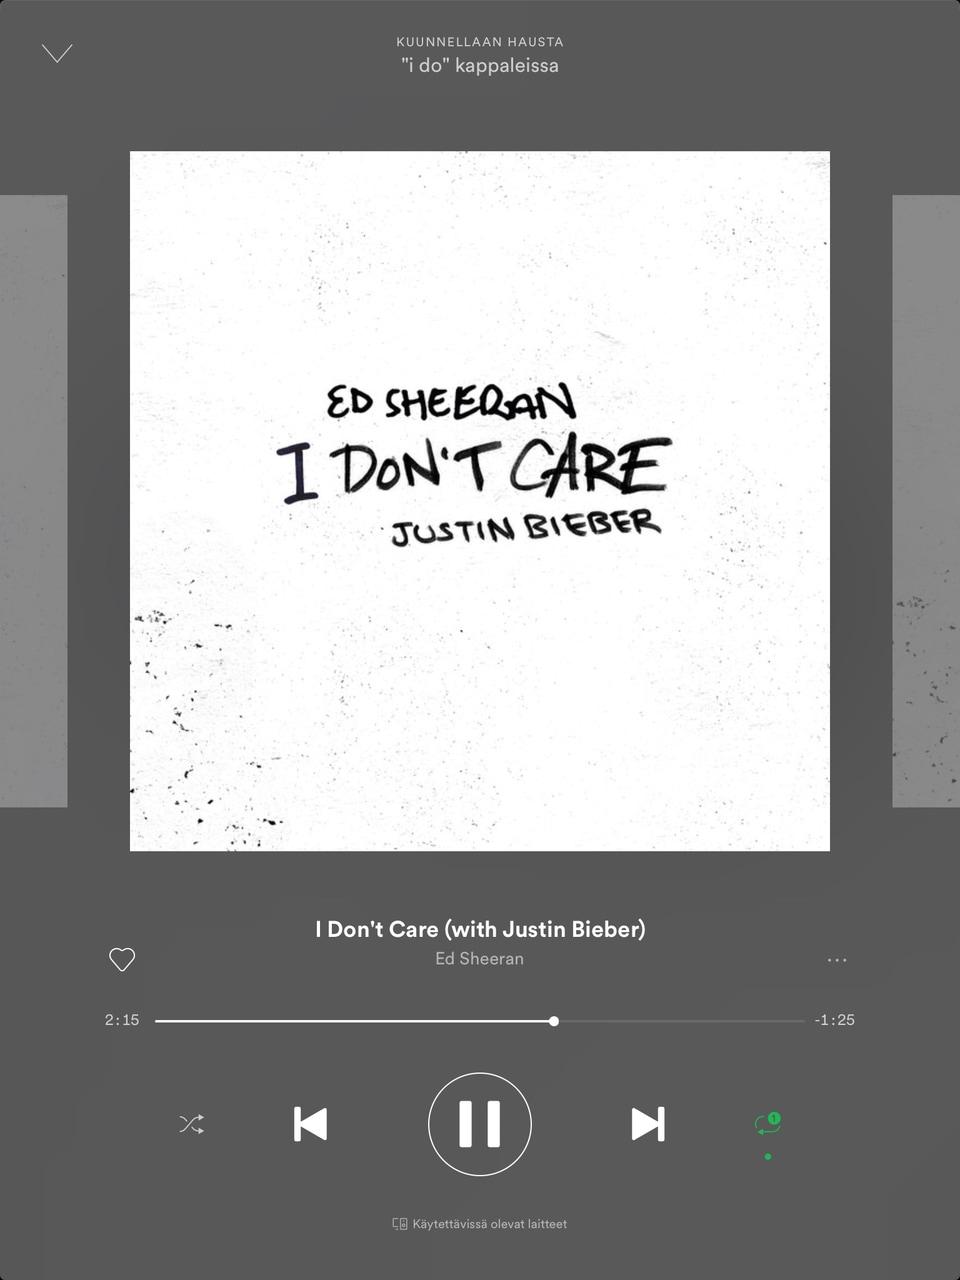 justin bieber, i don't care, and ed sheeran image